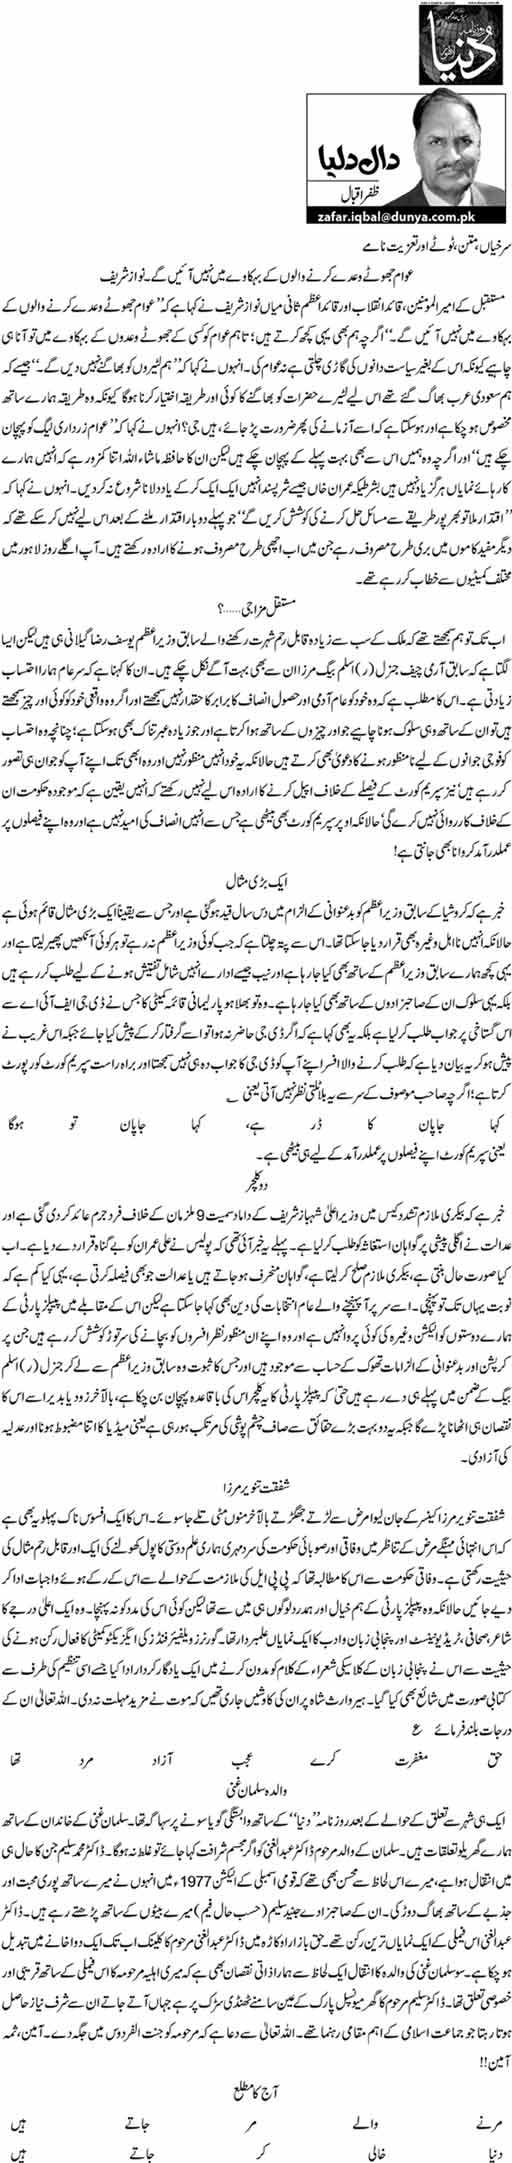 Surkhiyan, matan, totay aur taziyyat namay - Zafar Iqbal